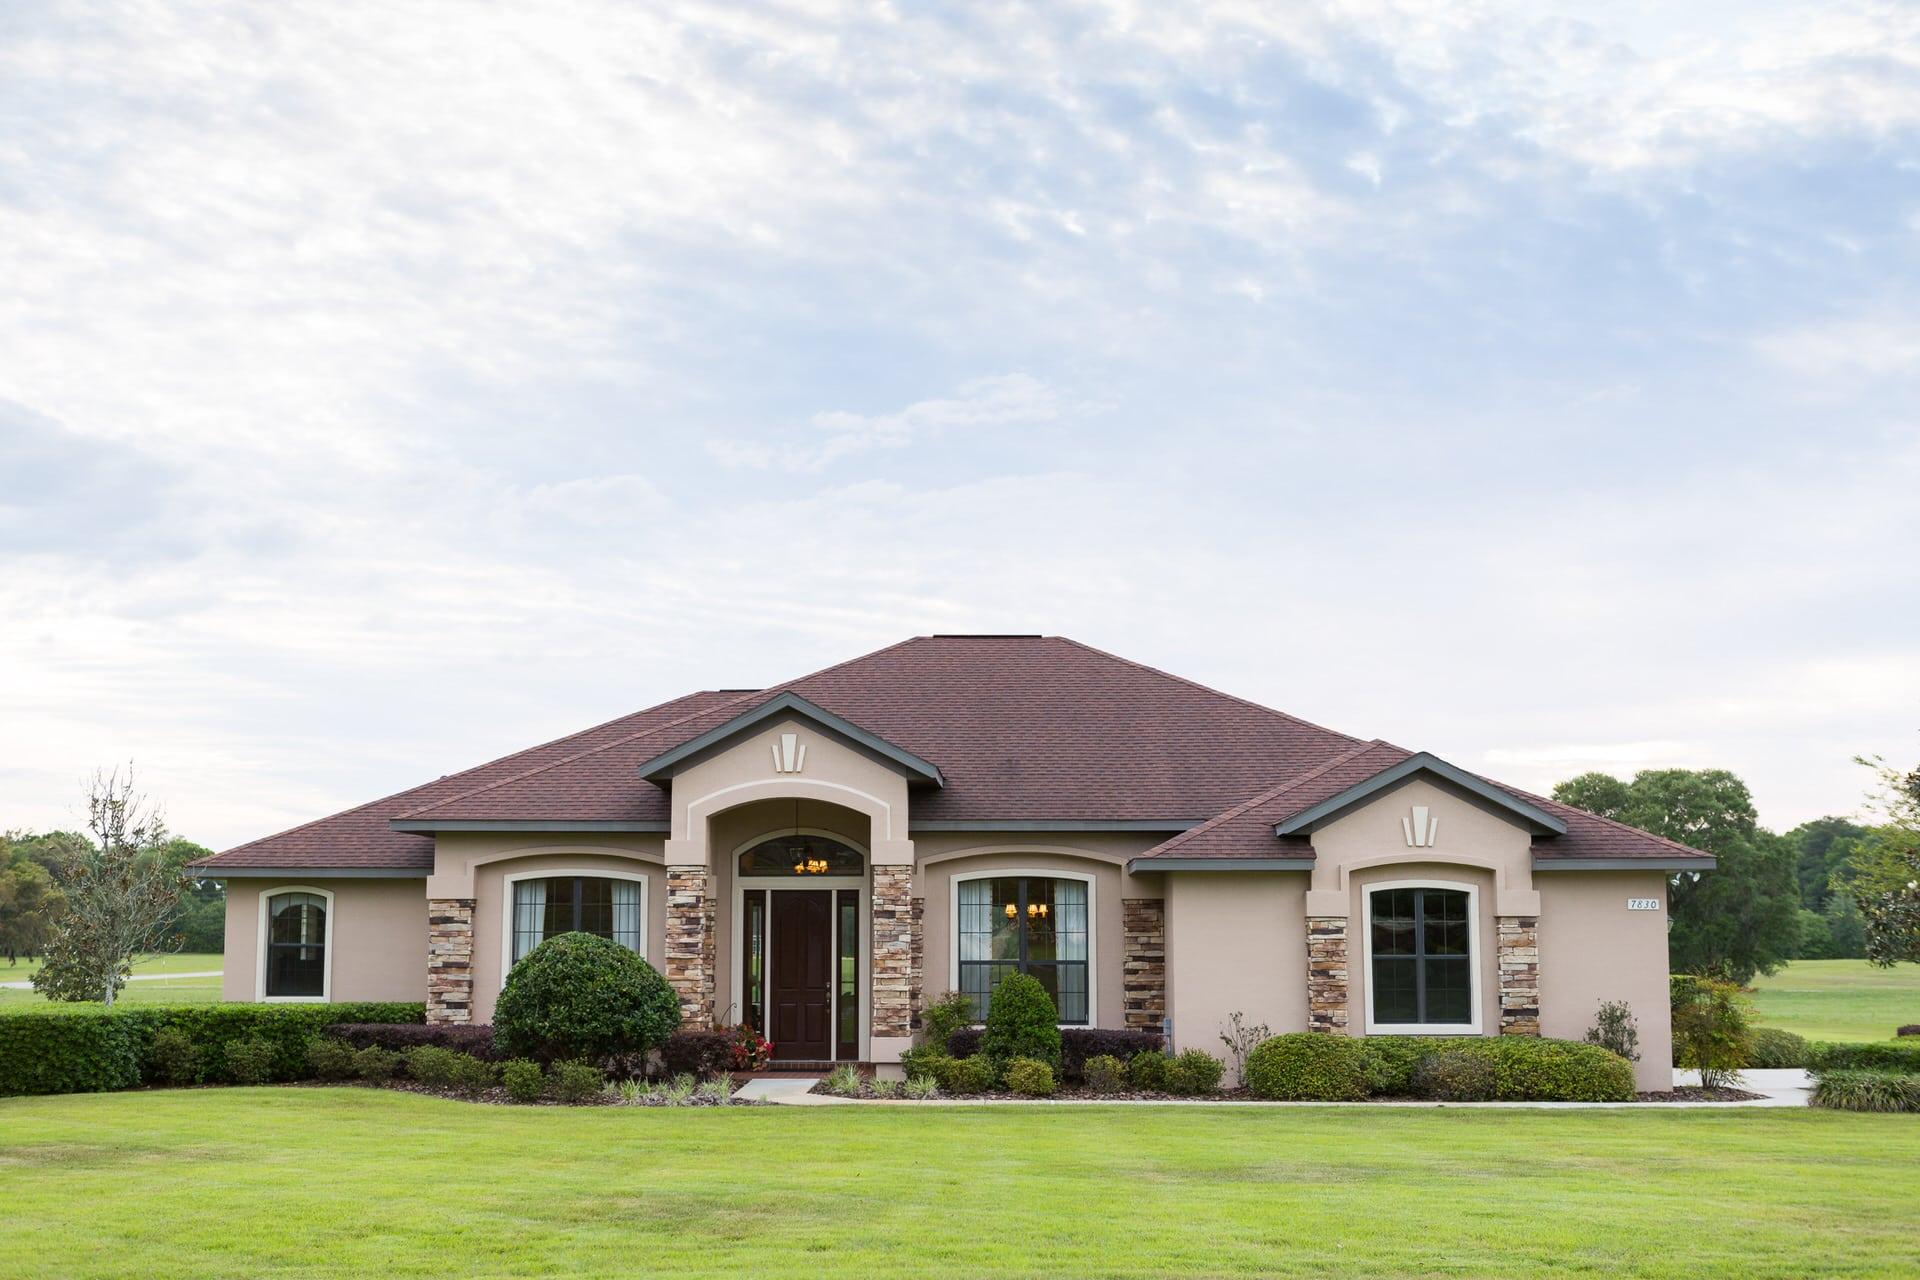 Windemere - Front Exterior - Curington Homes - Ocala Florida Contractor